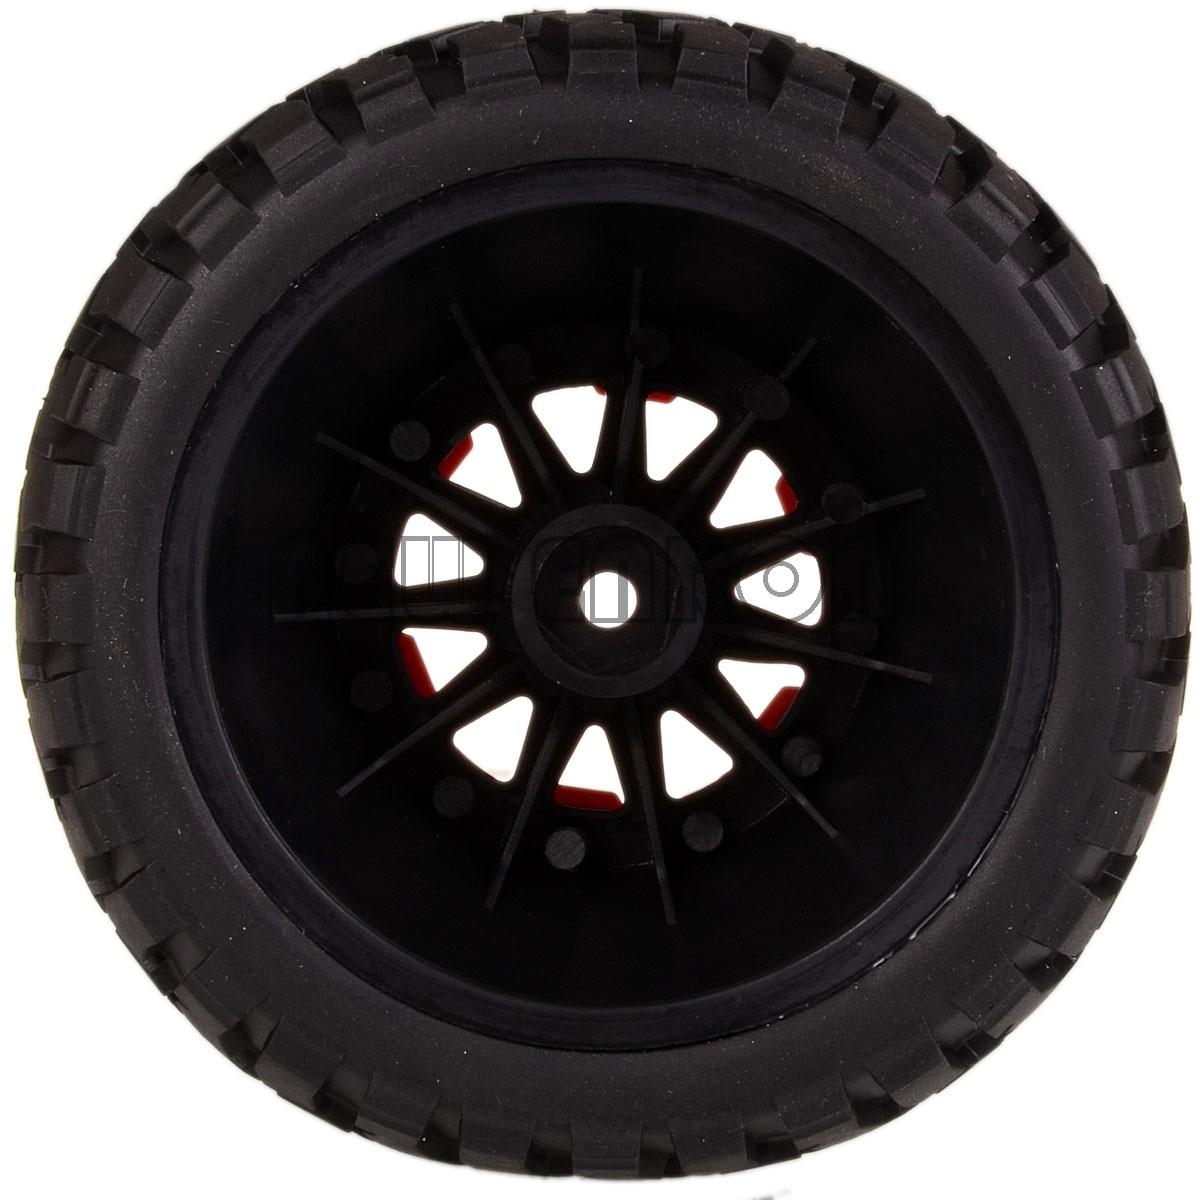 NEW Course <font><b>105</b></font>-108MM <font><b>Tire</b></font> & Bead-Lock Wheel Hub HEX FOR TRAXXAS SLASH 10SC